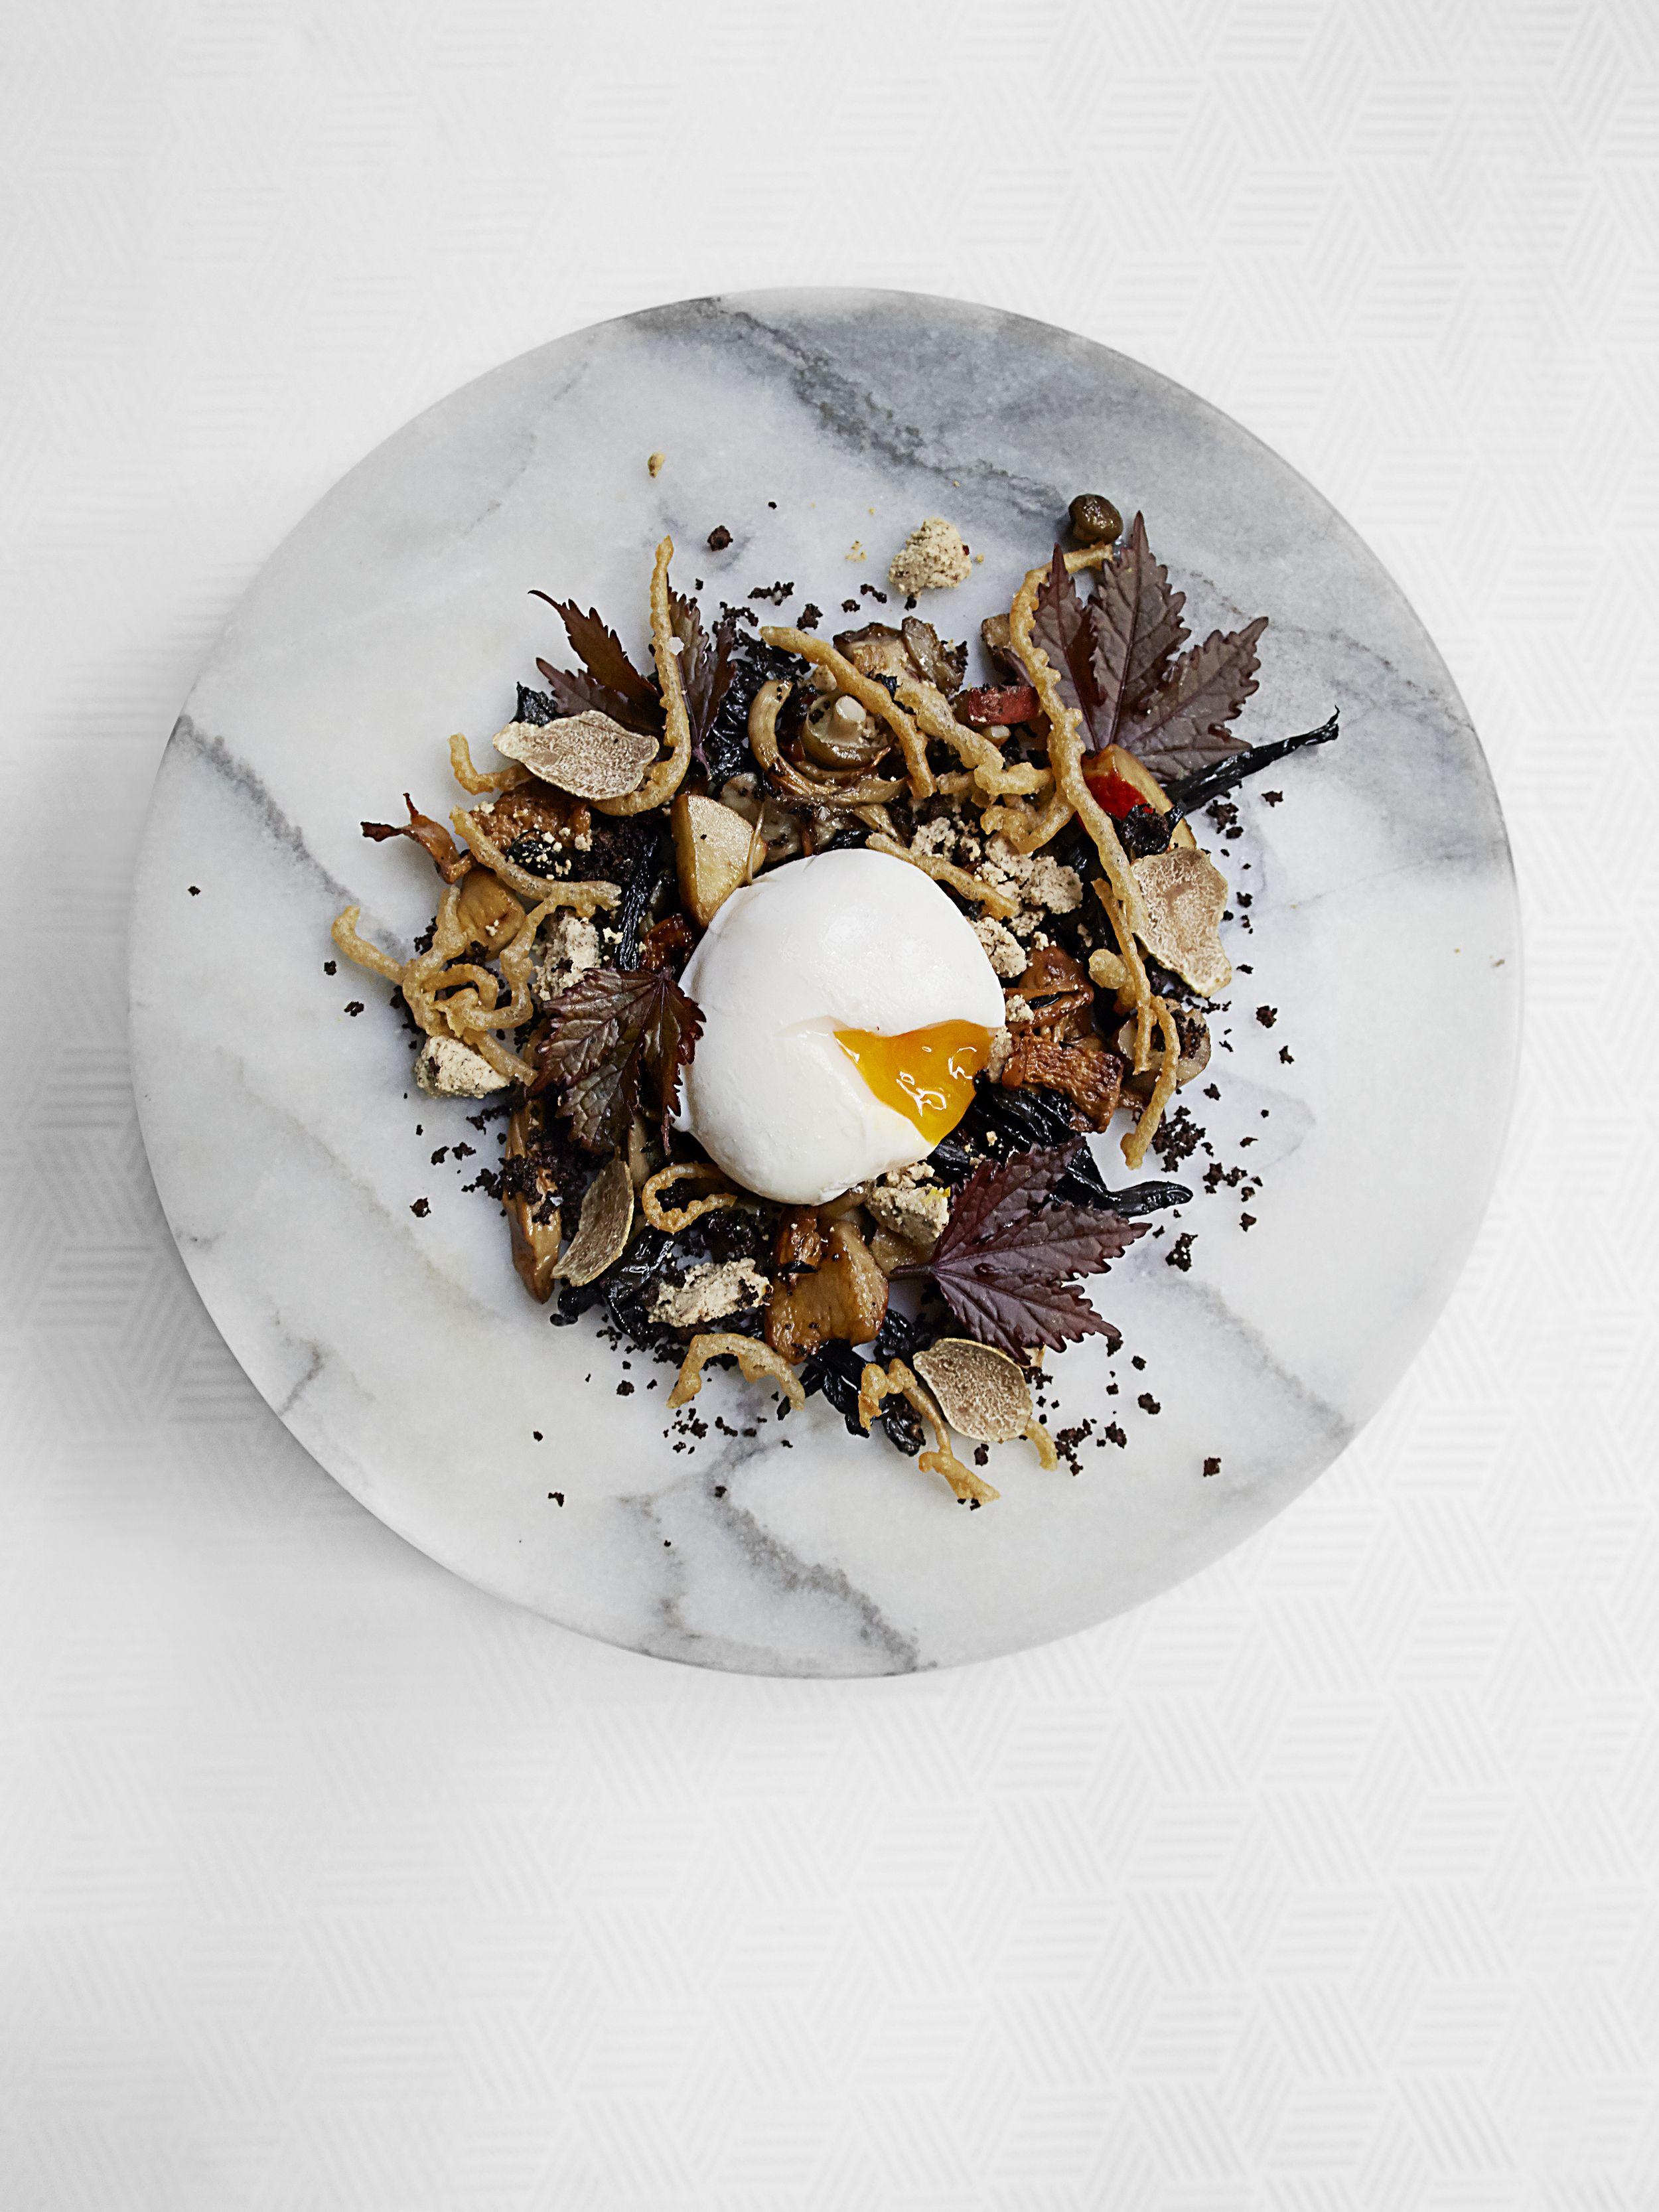 Aquavit Restaurant Michelin Food Photographing Food Michelin Star Food